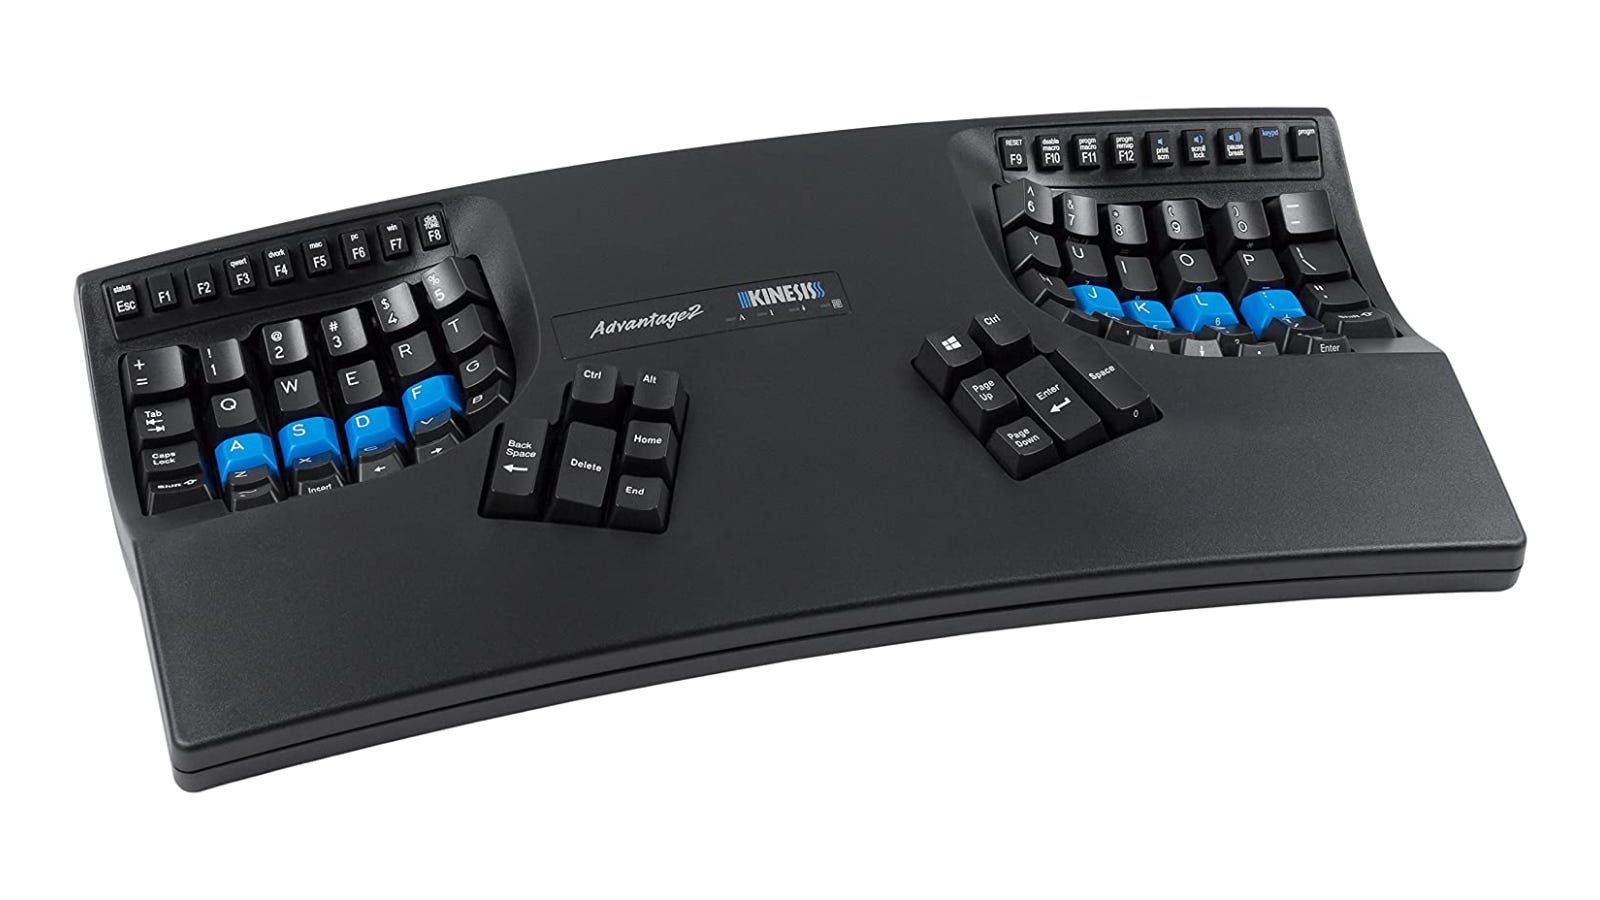 Kinesis Advantage2 Keyboard